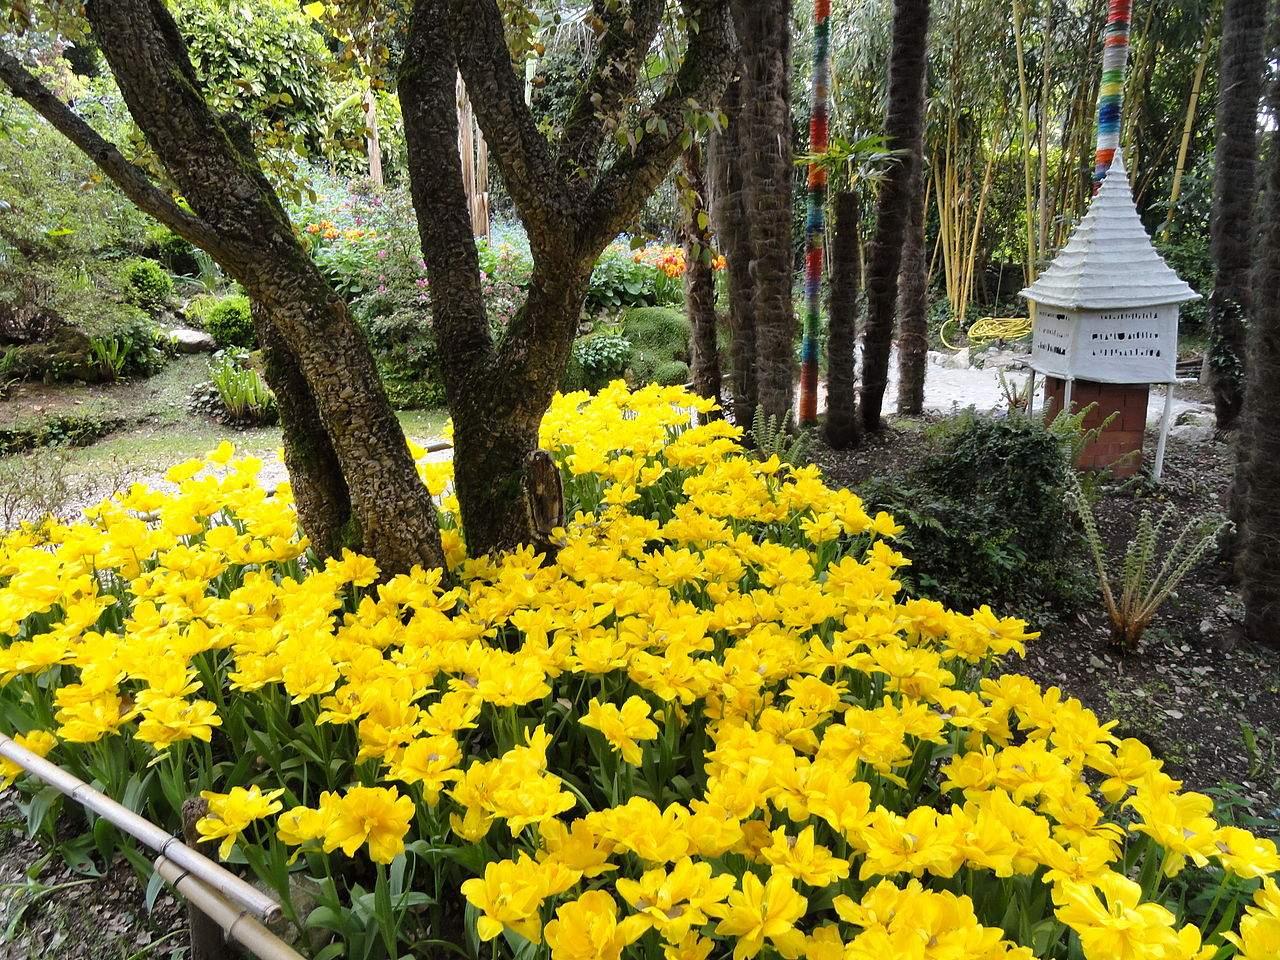 1280px Giardino Botanico Fondazione André Heller DSC JPG